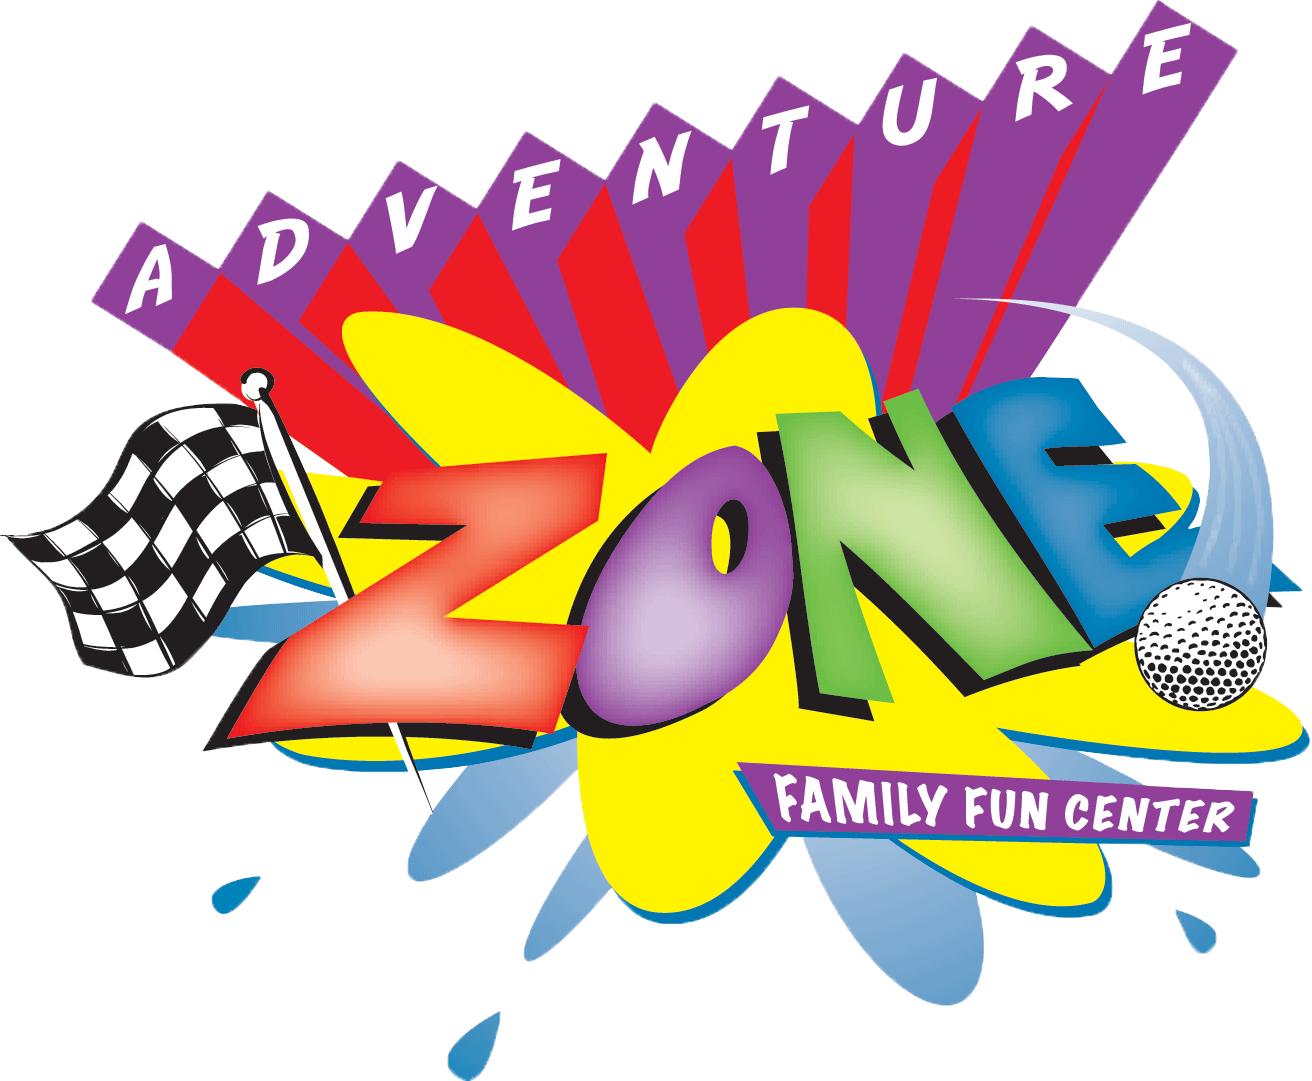 az-family-fun-center.png